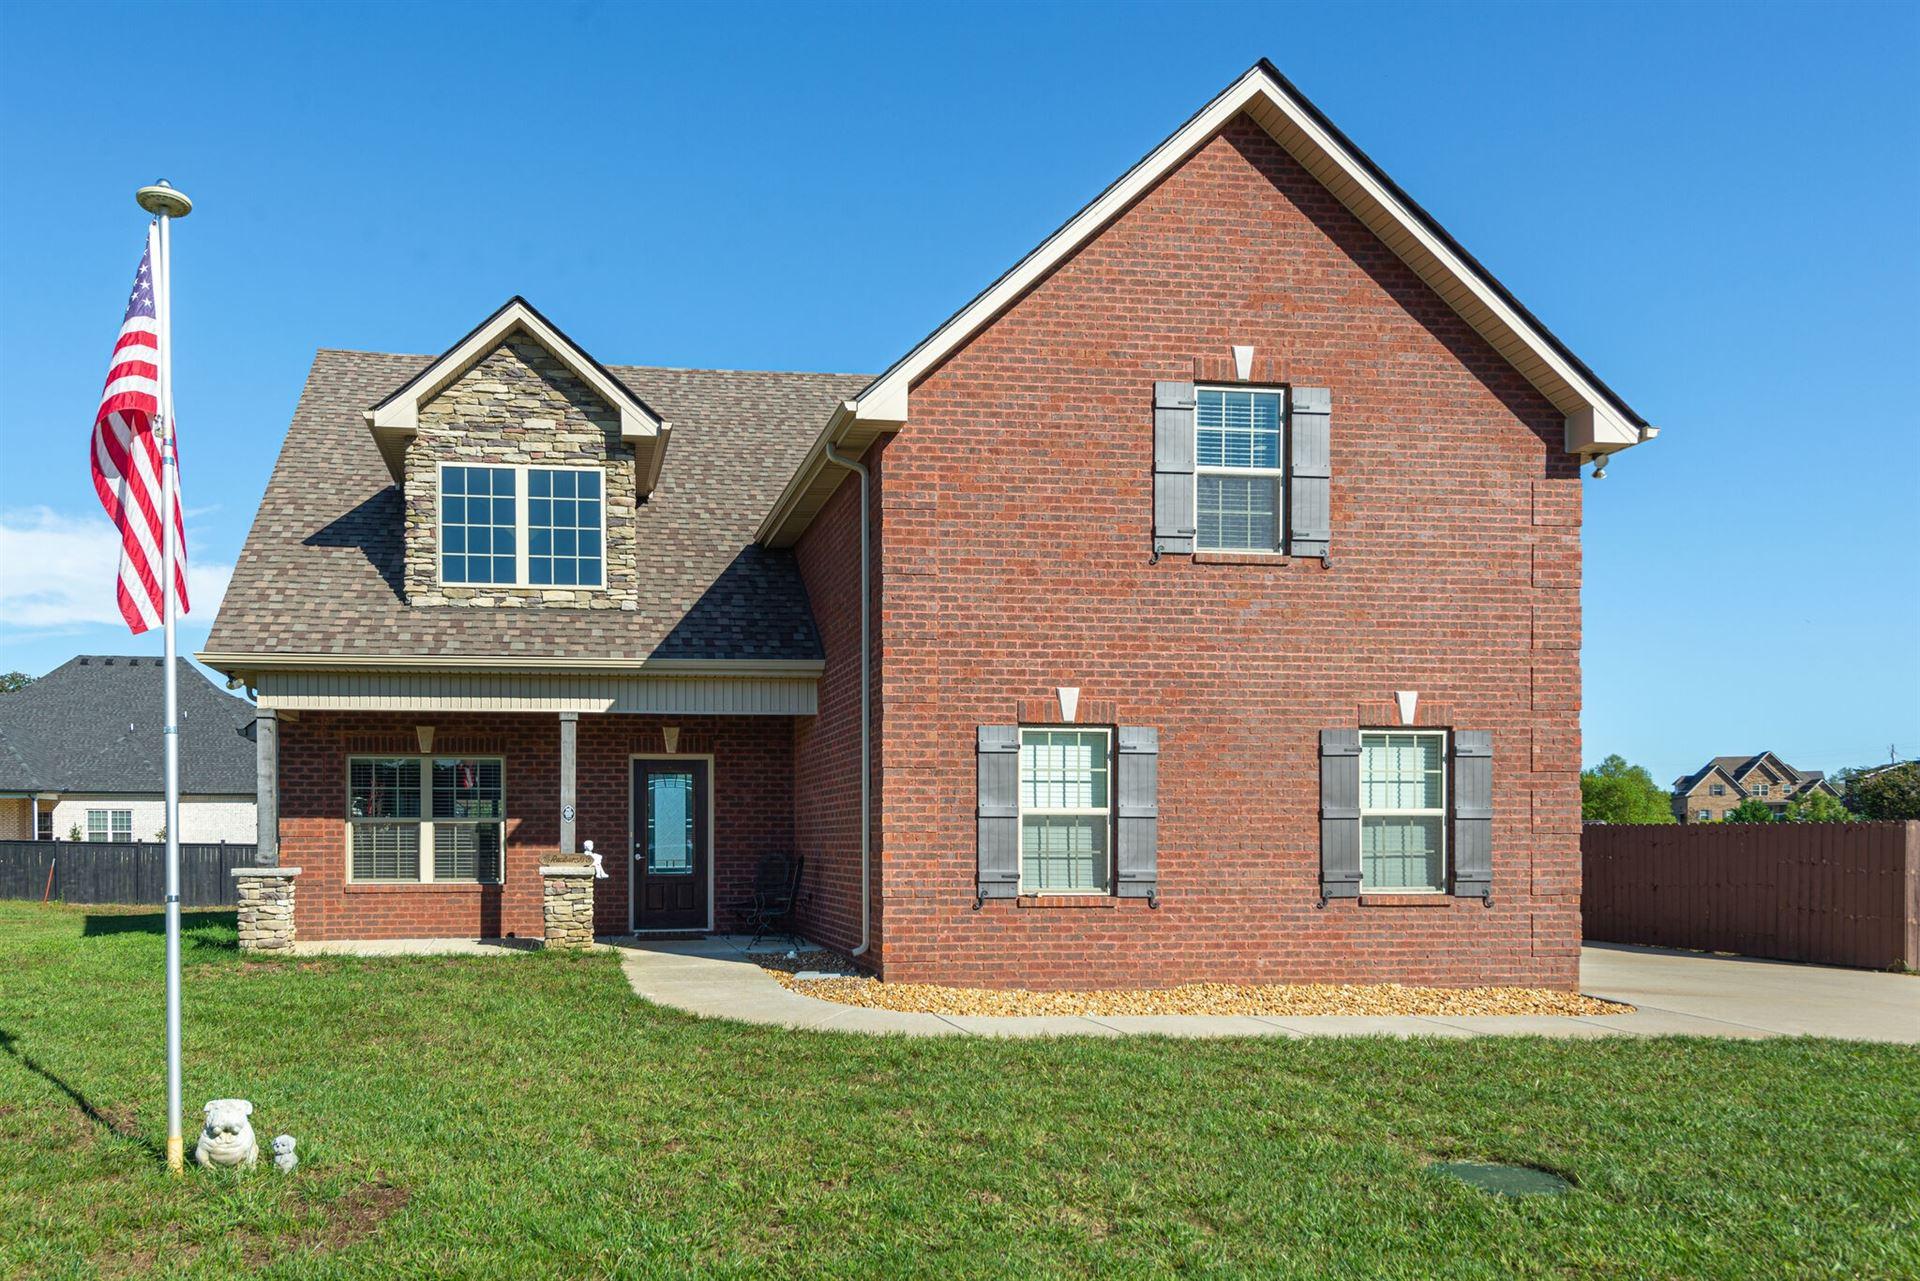 1006 Sycamore Leaf Way, Murfreesboro, TN 37129 - MLS#: 2293709